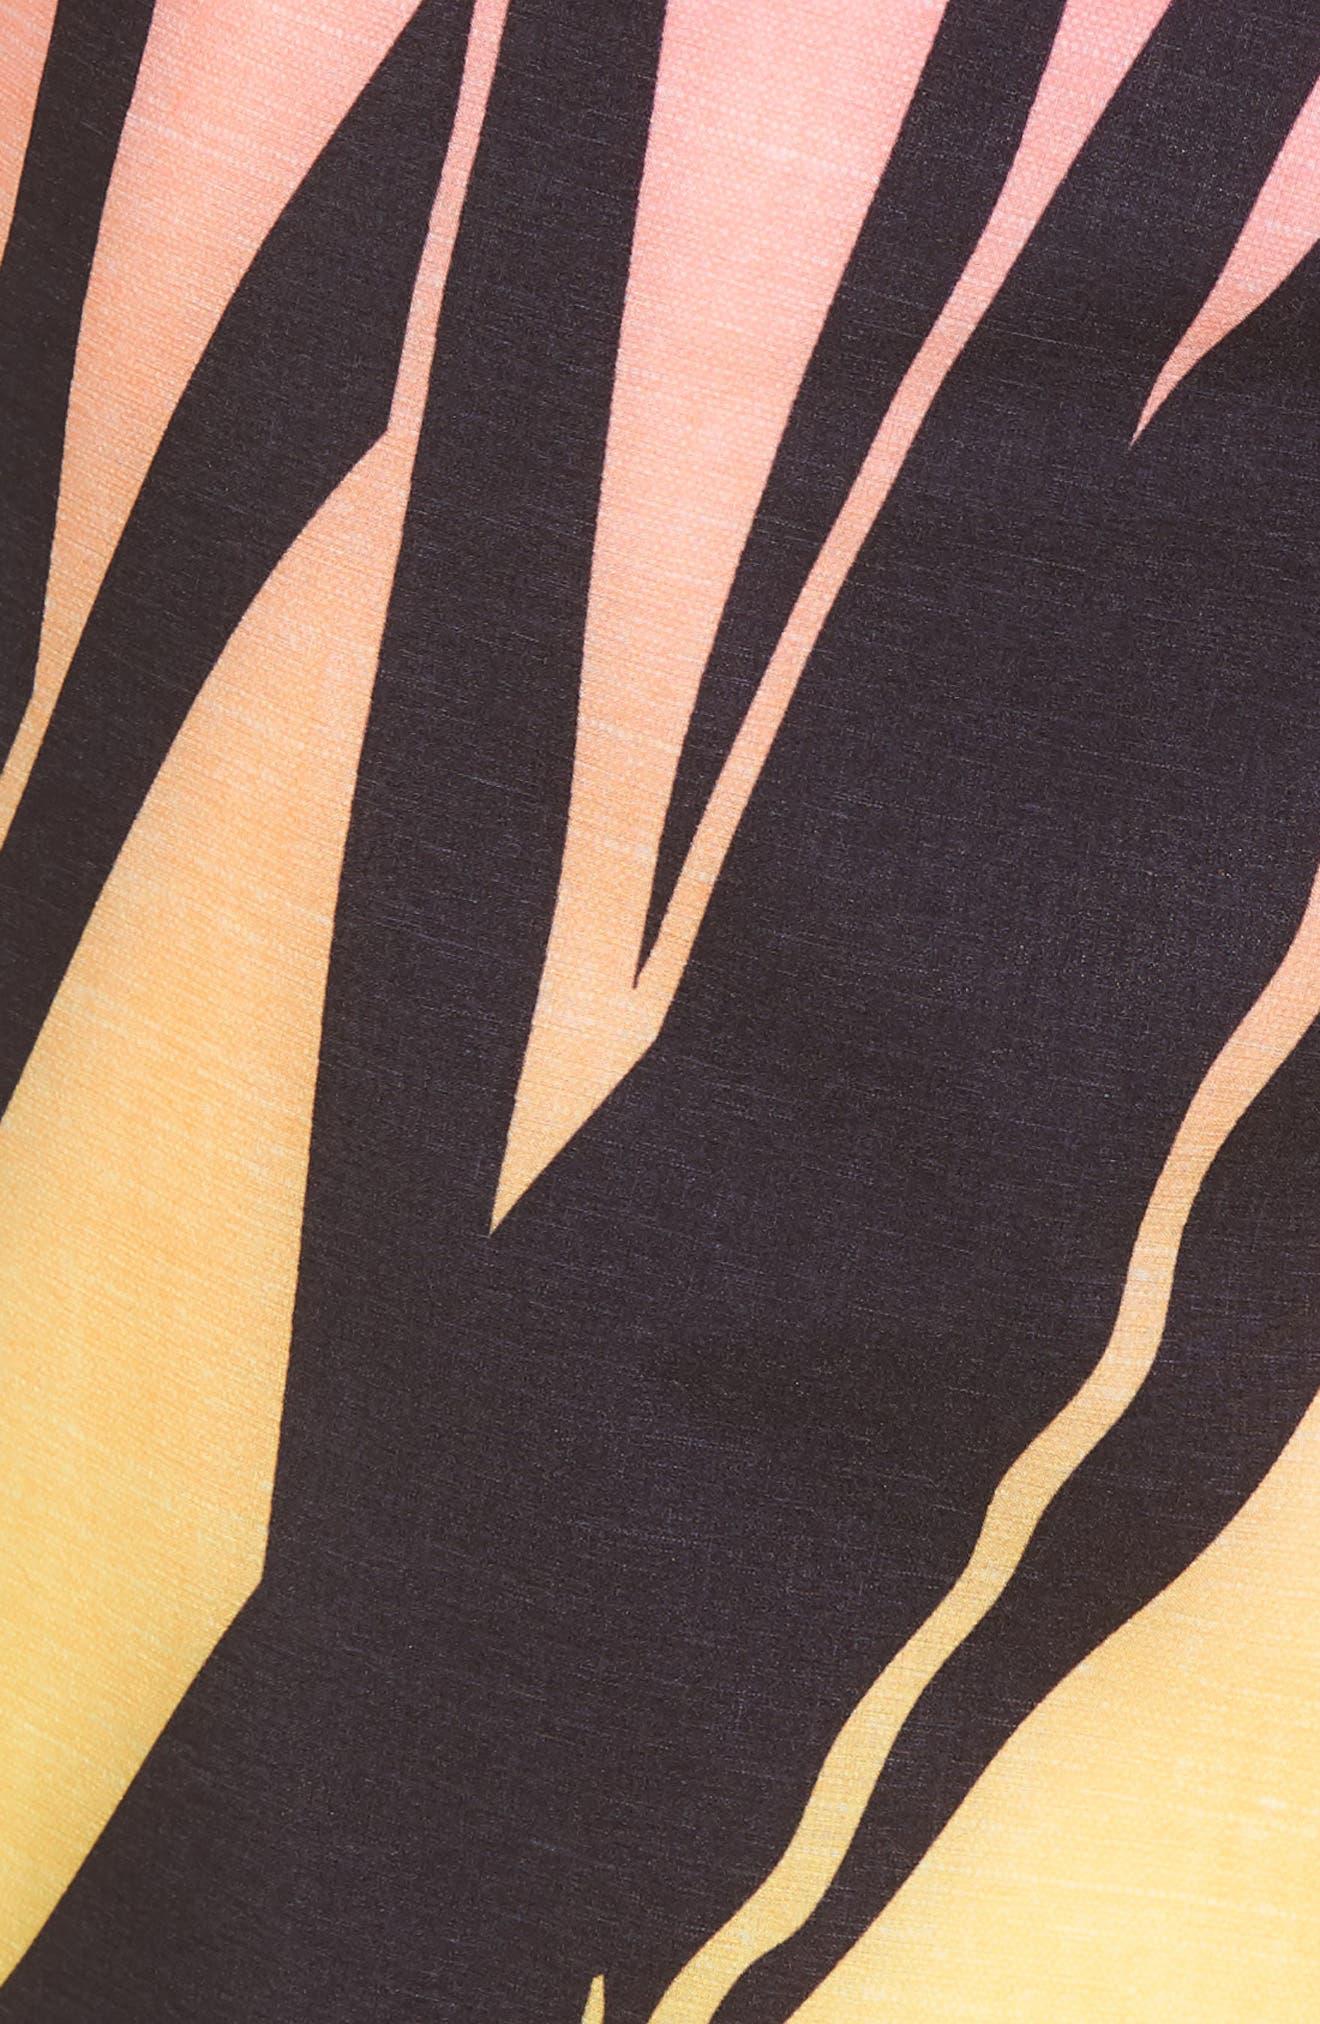 JJF IV Kahuliwae Board Shorts,                             Alternate thumbnail 5, color,                             Hyper Pink